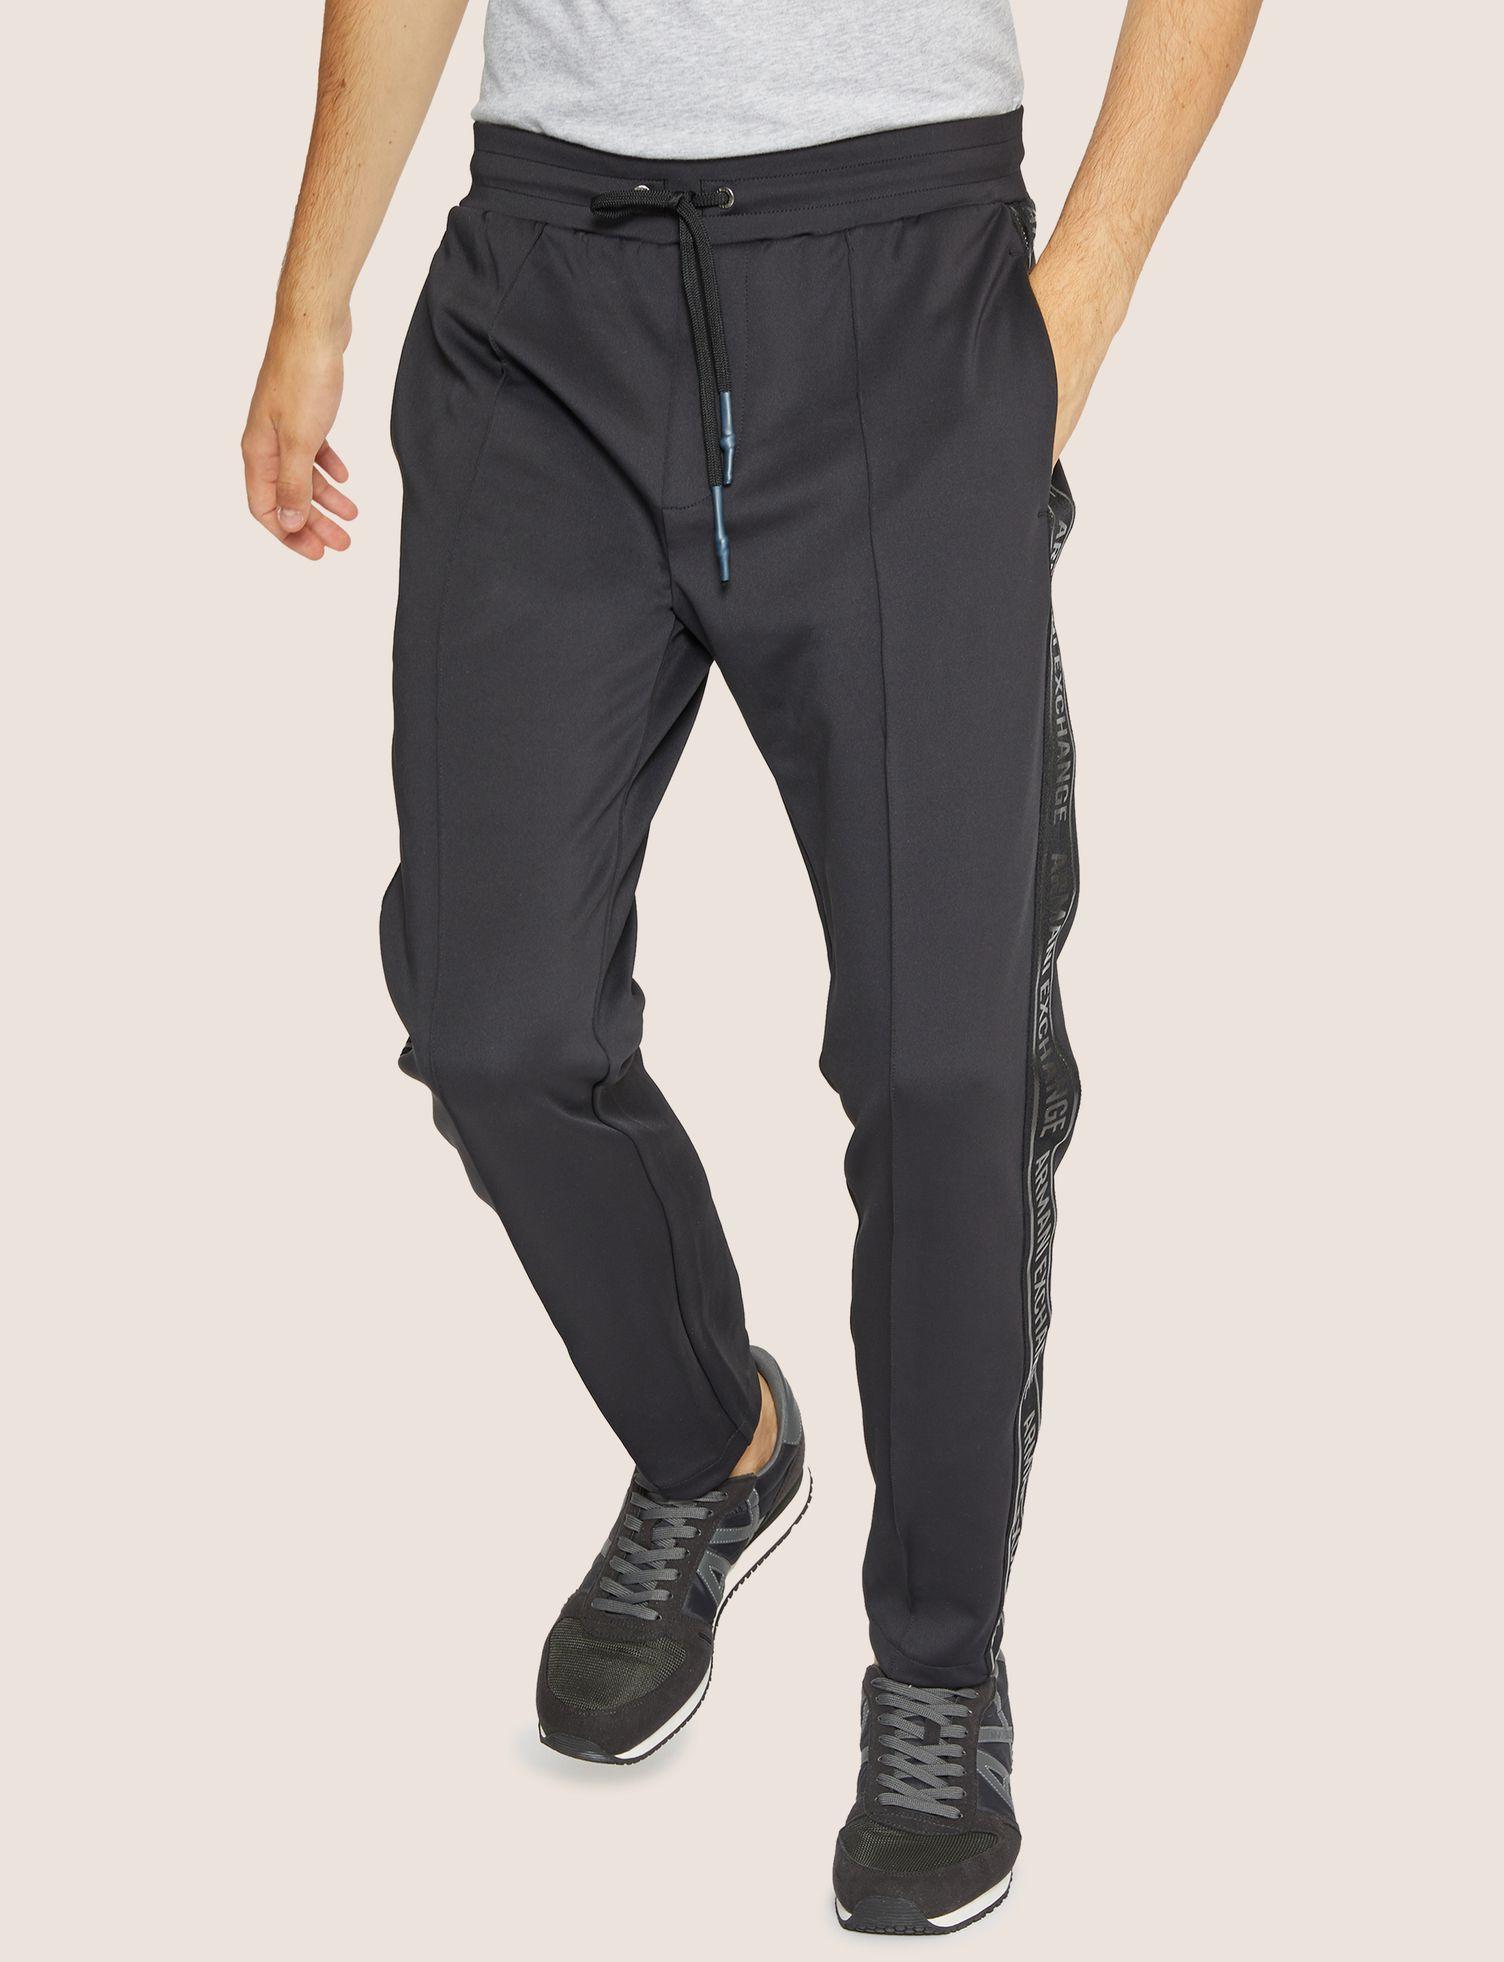 61387b42b0 ARMANI EXCHANGE HIGH-SHINE LOGO TAPE SWEATPANT Fleece Pant Man f ...